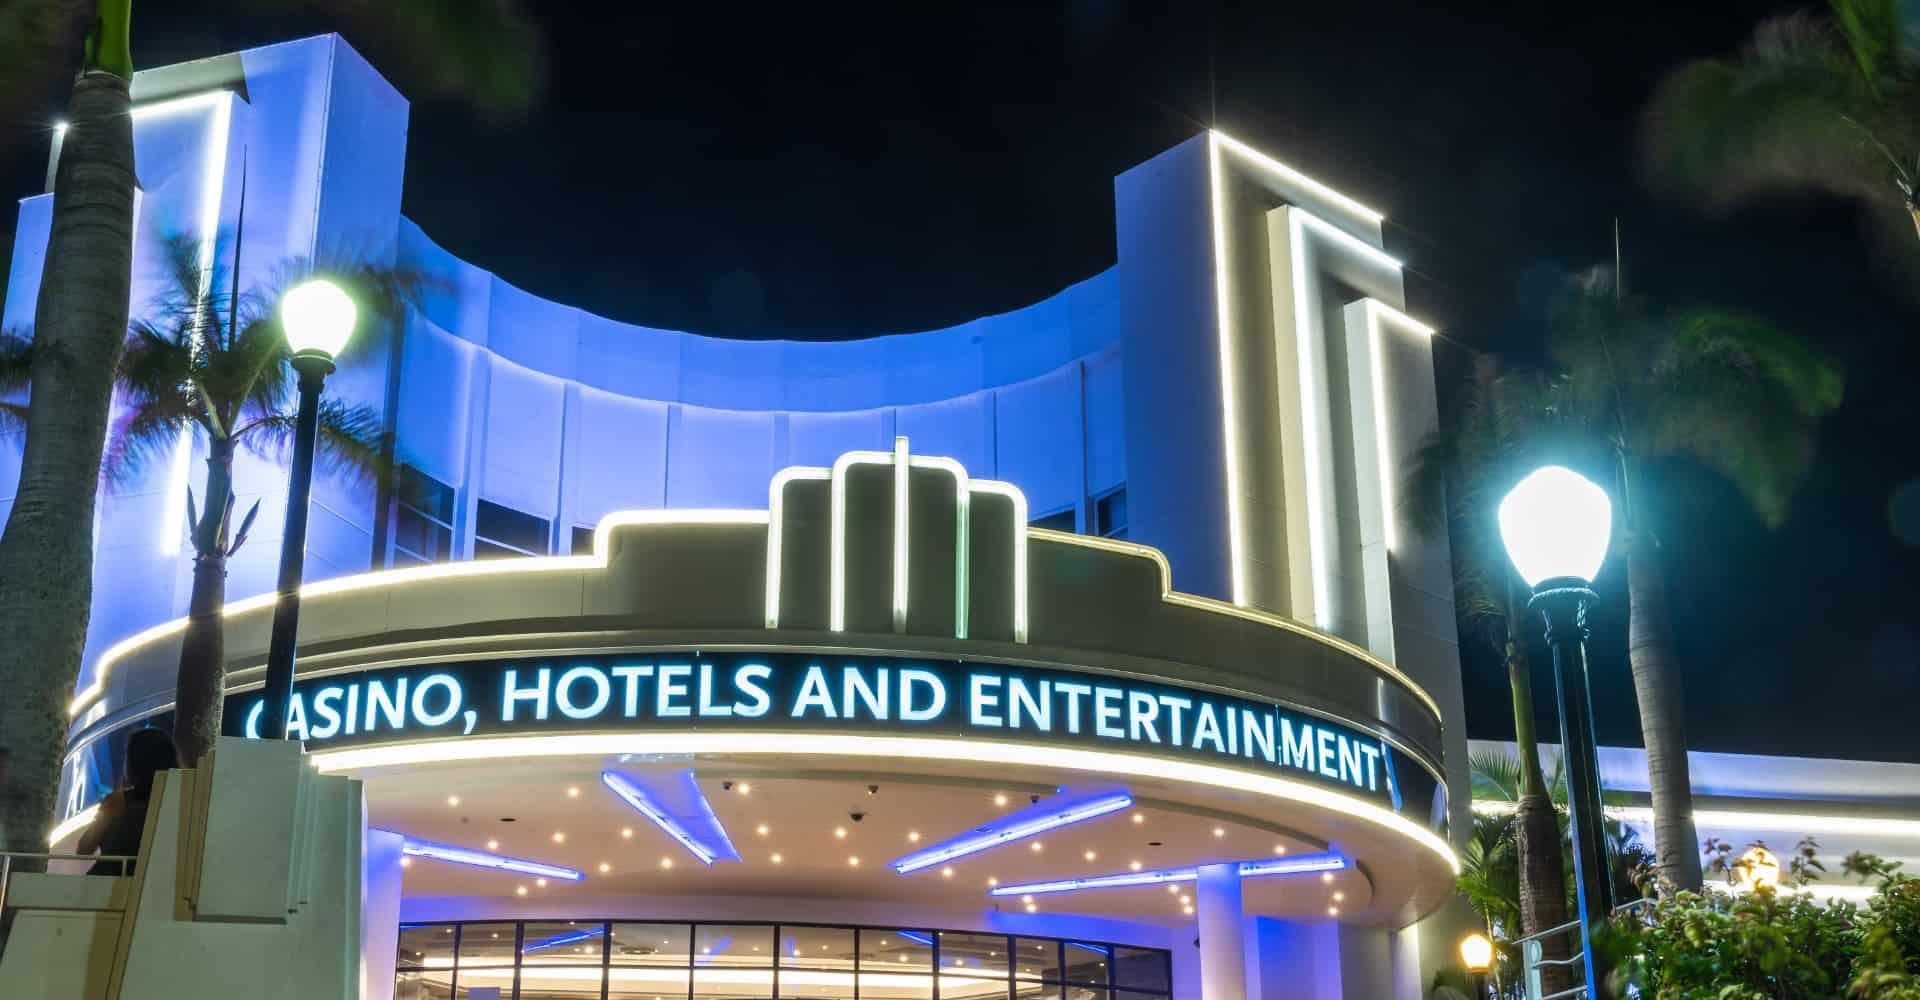 Suncoast Casino Durban South Africa